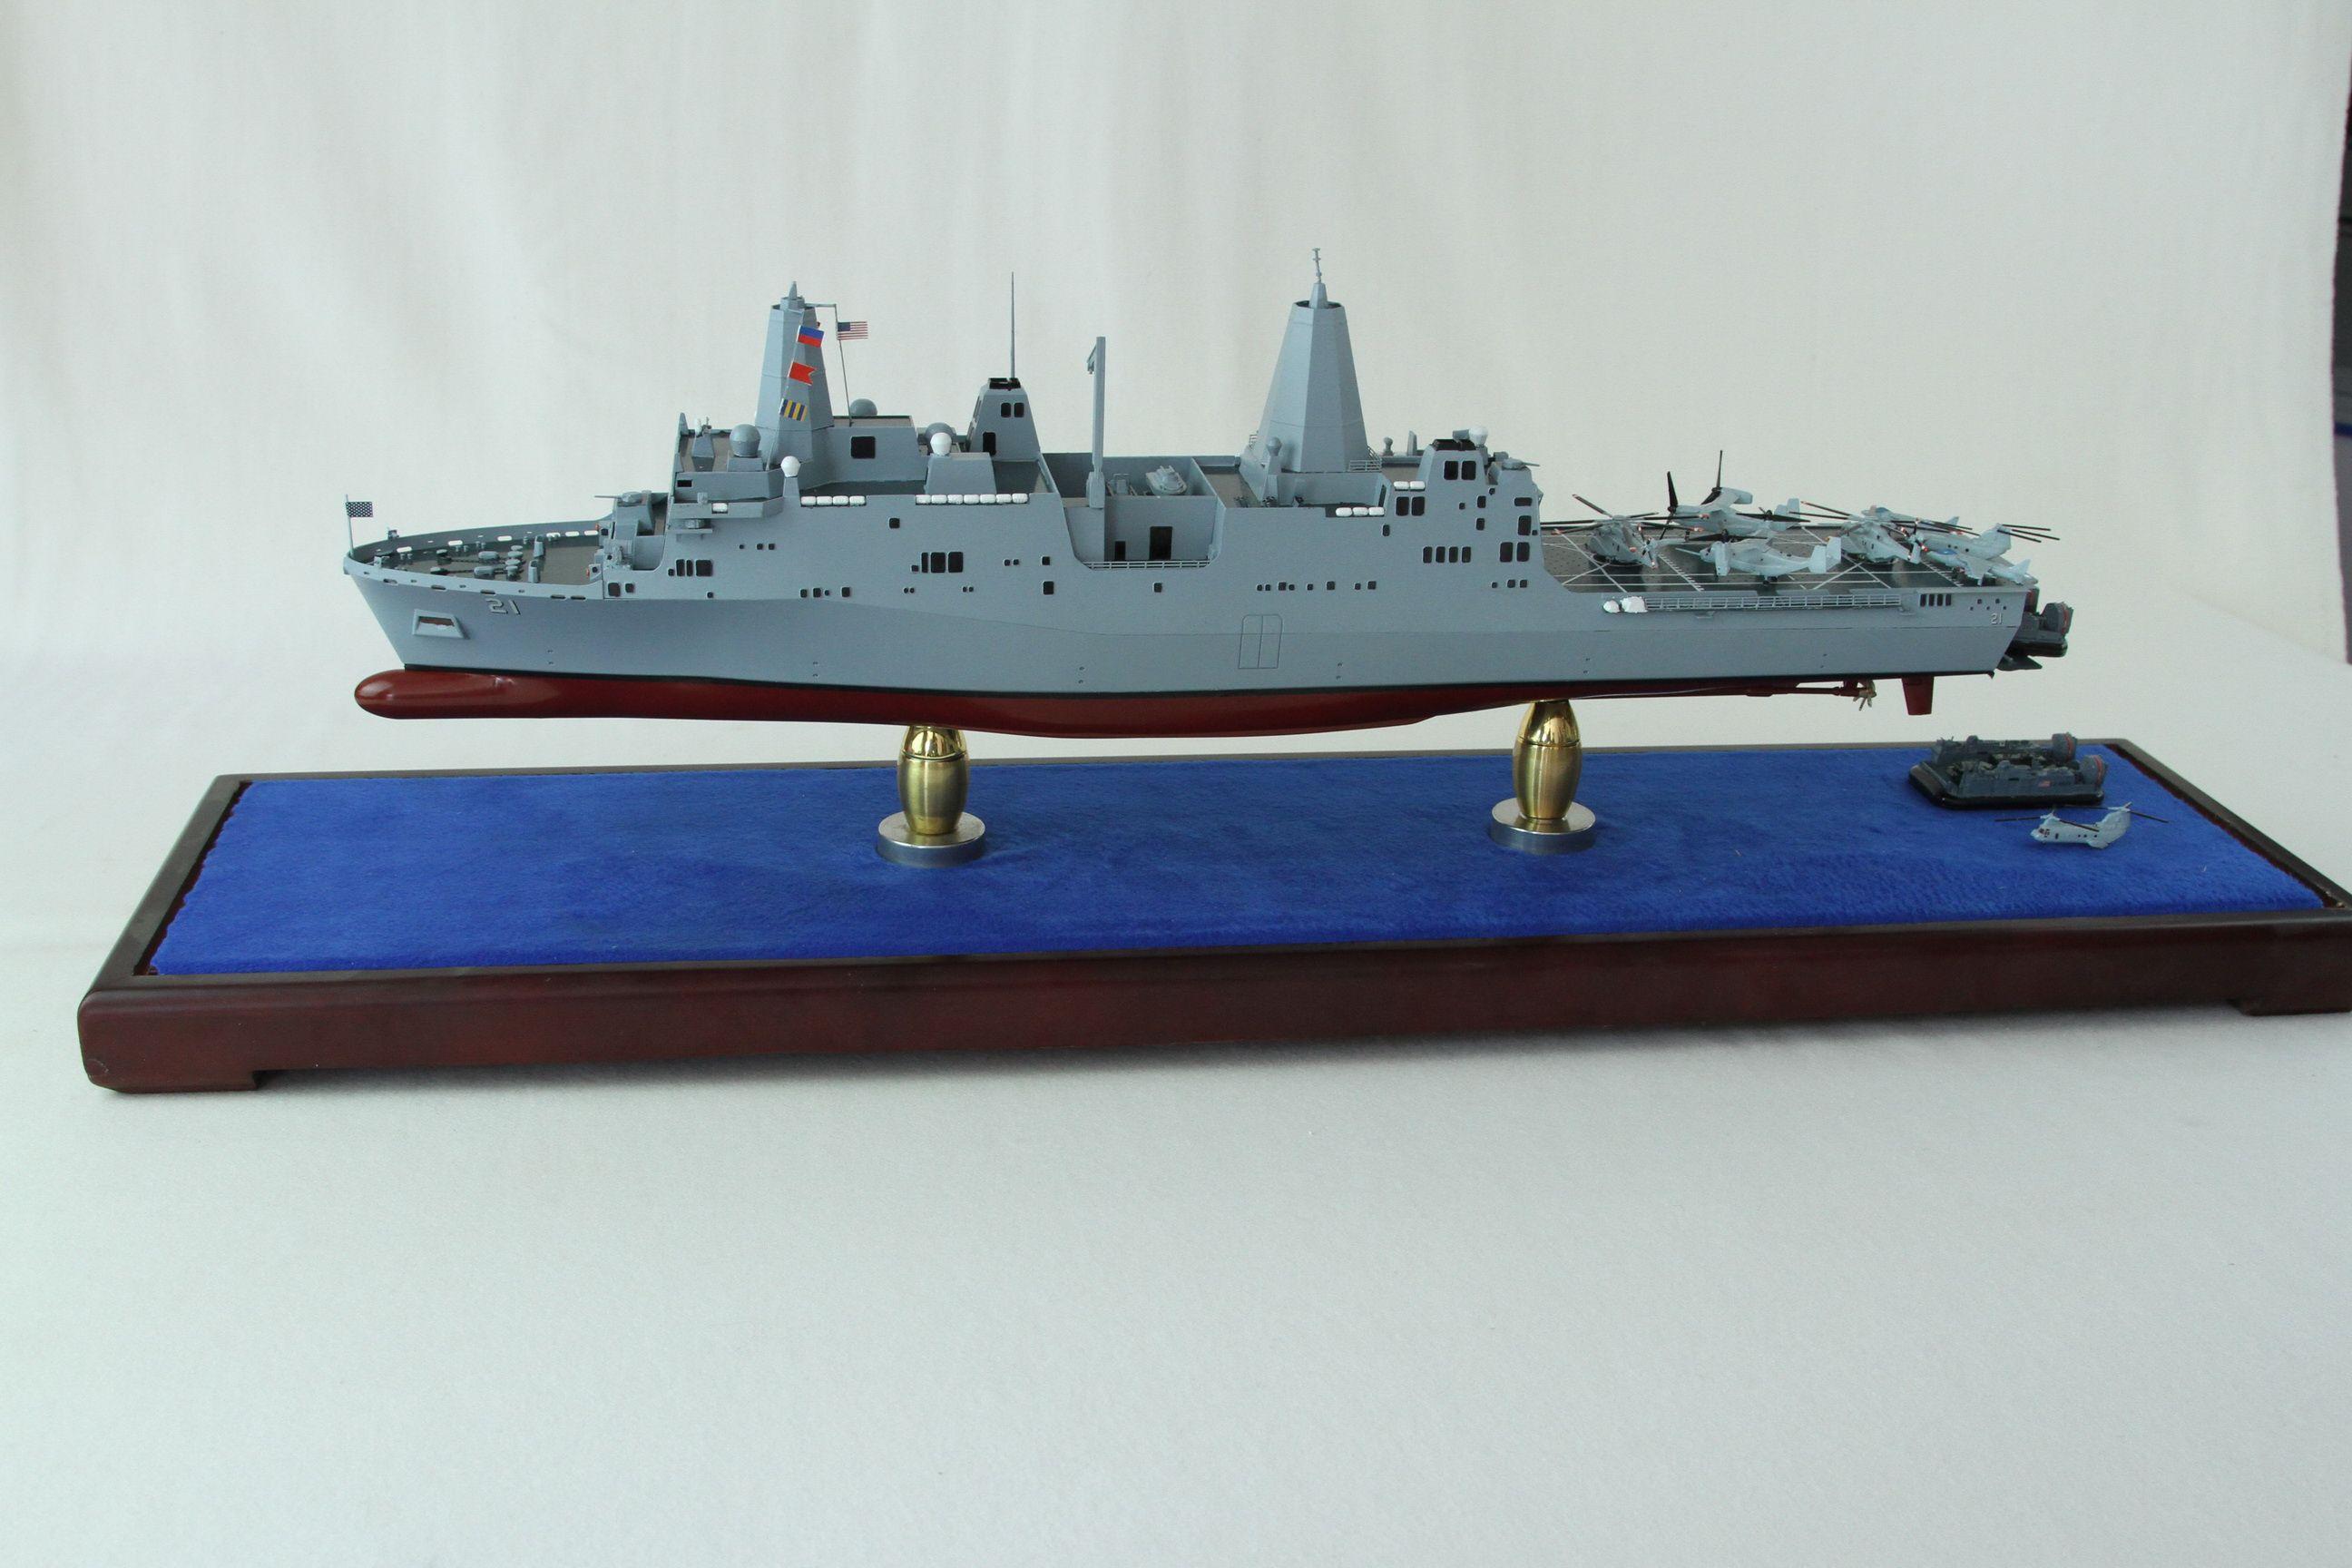 LPD211,SAN ANTONIO Class New York Model Uss nimitz, Uss